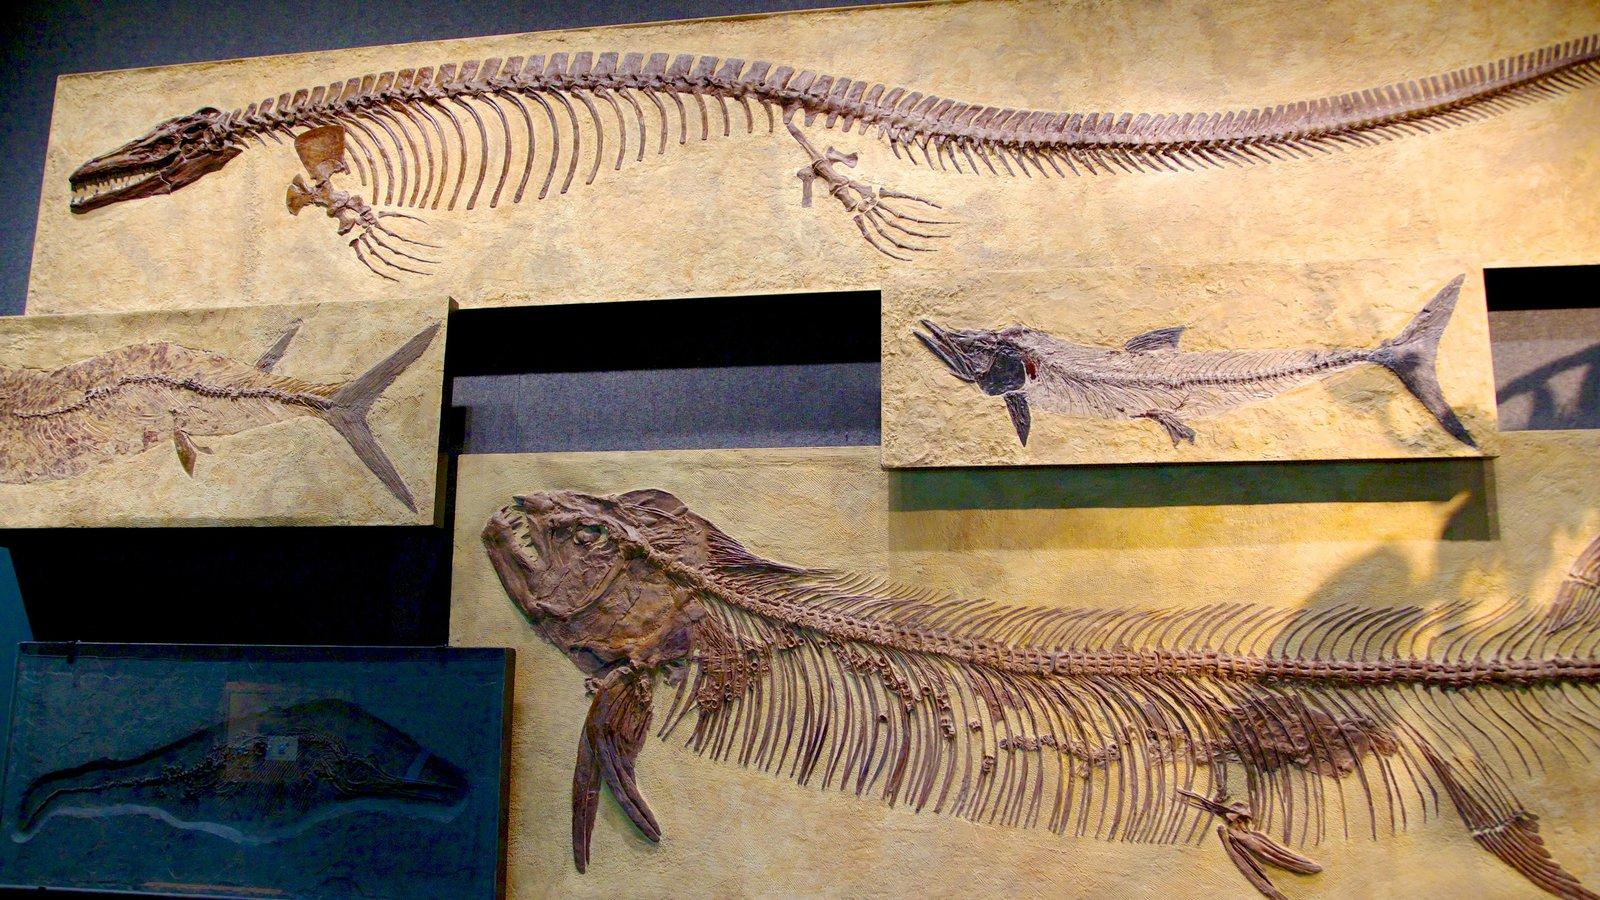 Denver Museum of Nature and Science caracterizando vistas internas